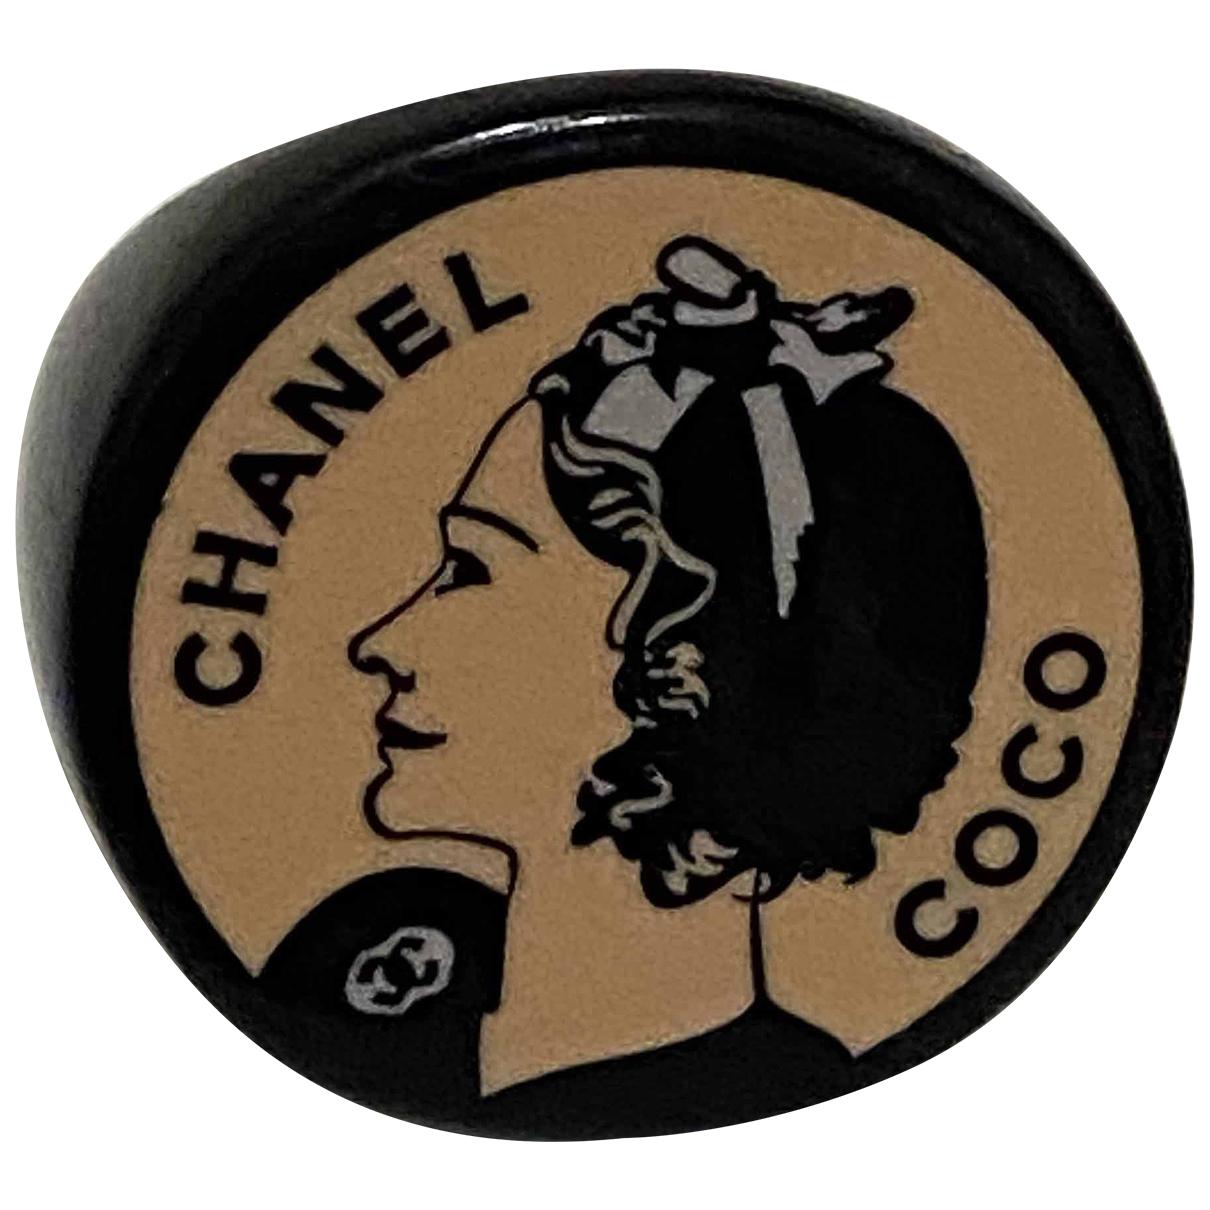 Chanel \N Ring in  Schwarz Kunststoff